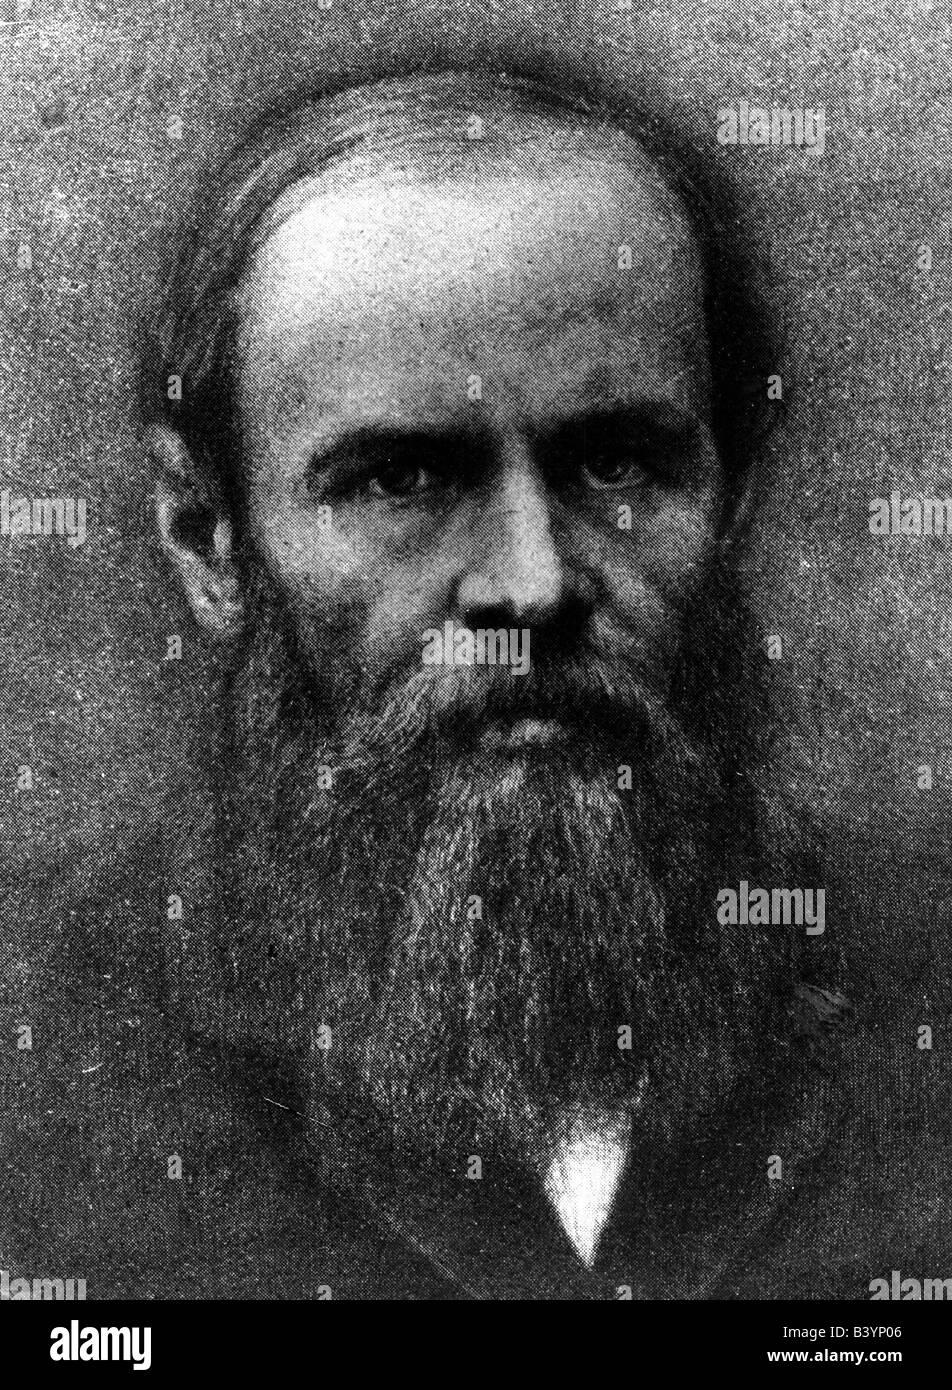 Dostoevsky, Fyodor Mikhailovich, 11.11.1821 - 9.2.1881, Russian writer, novelist, portrait, Additional-Rights-Clearances - Stock Image